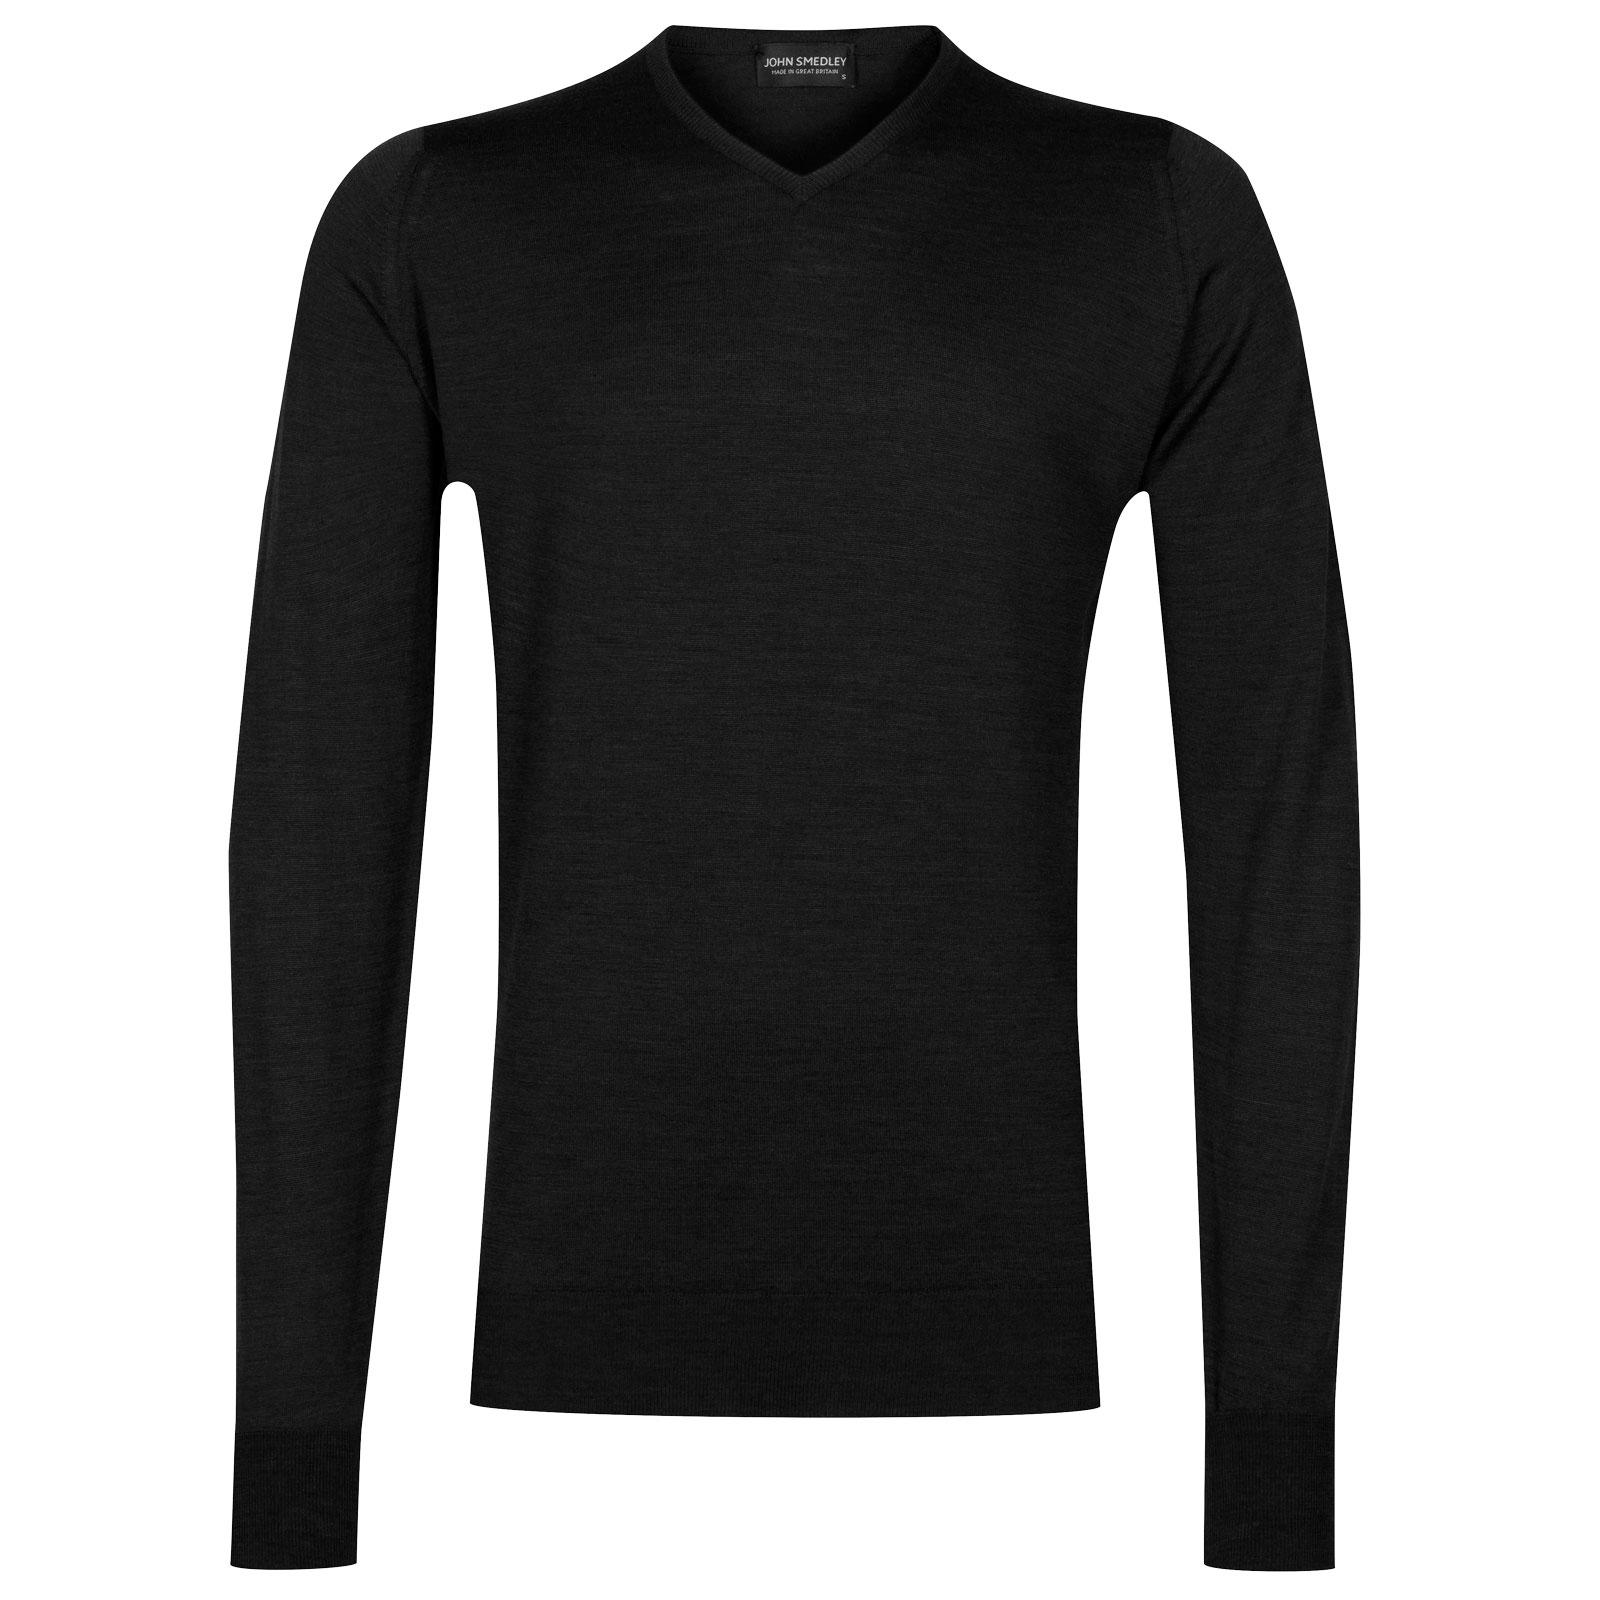 John Smedley shipton Merino Wool Pullover in Black-M